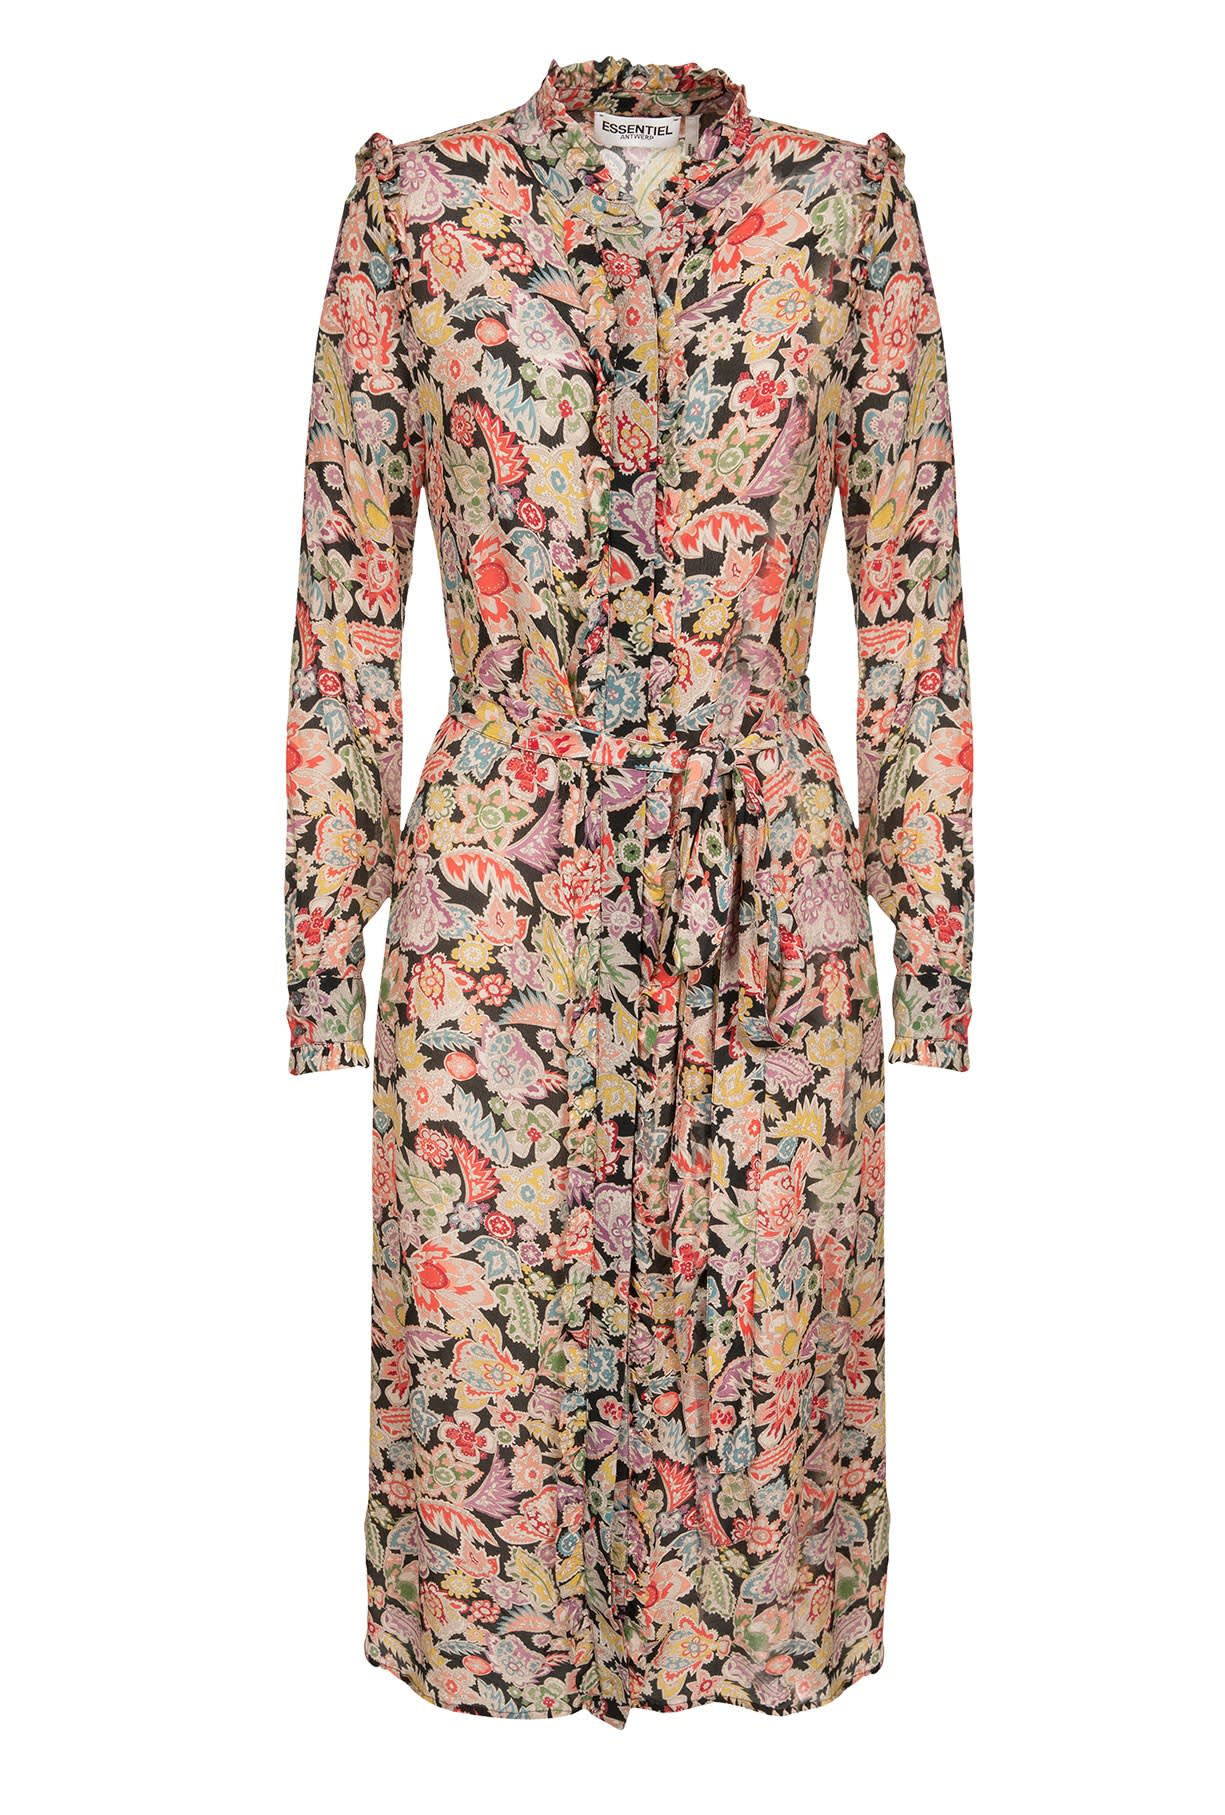 Essentiel Antwerp Ratatou Ruffled Shirt Dress